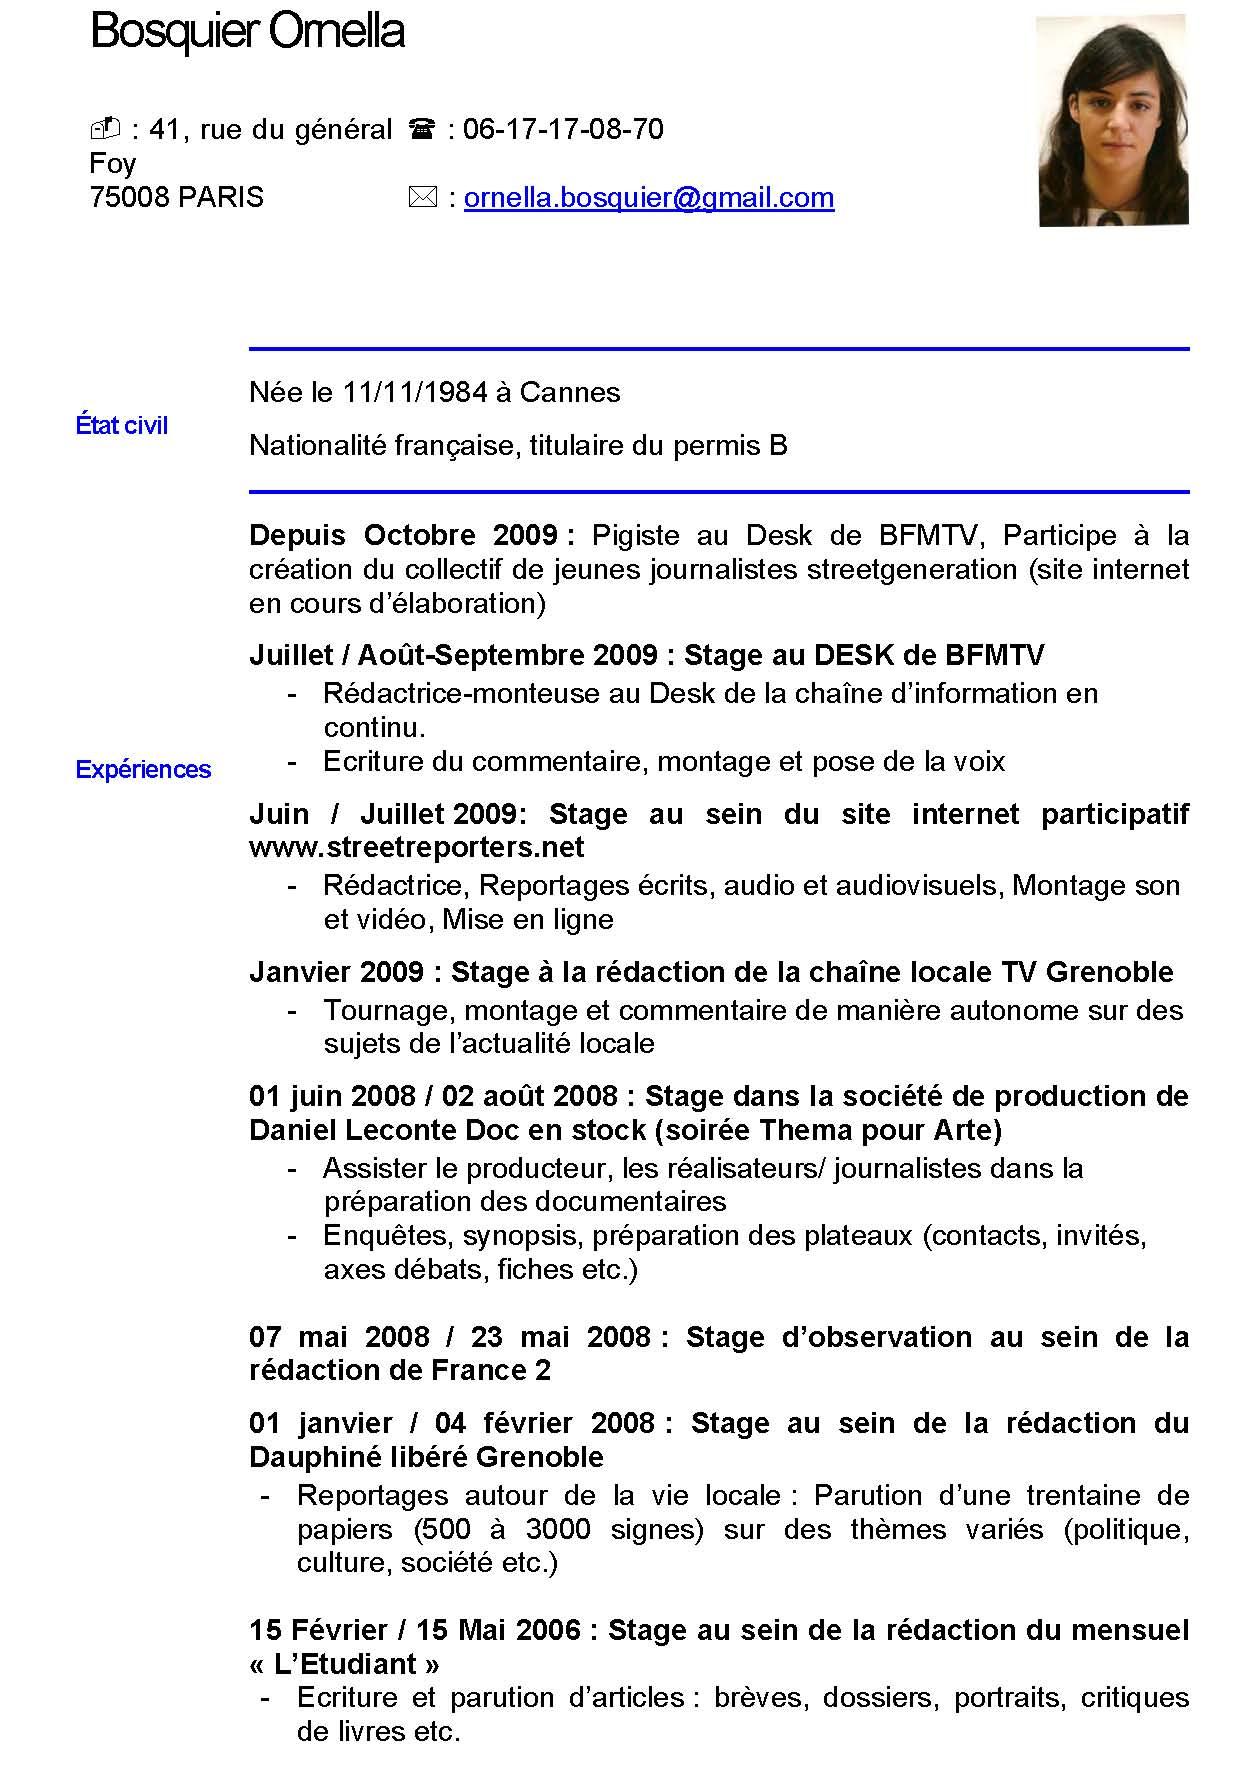 resume format  modele cv gratuit journaliste